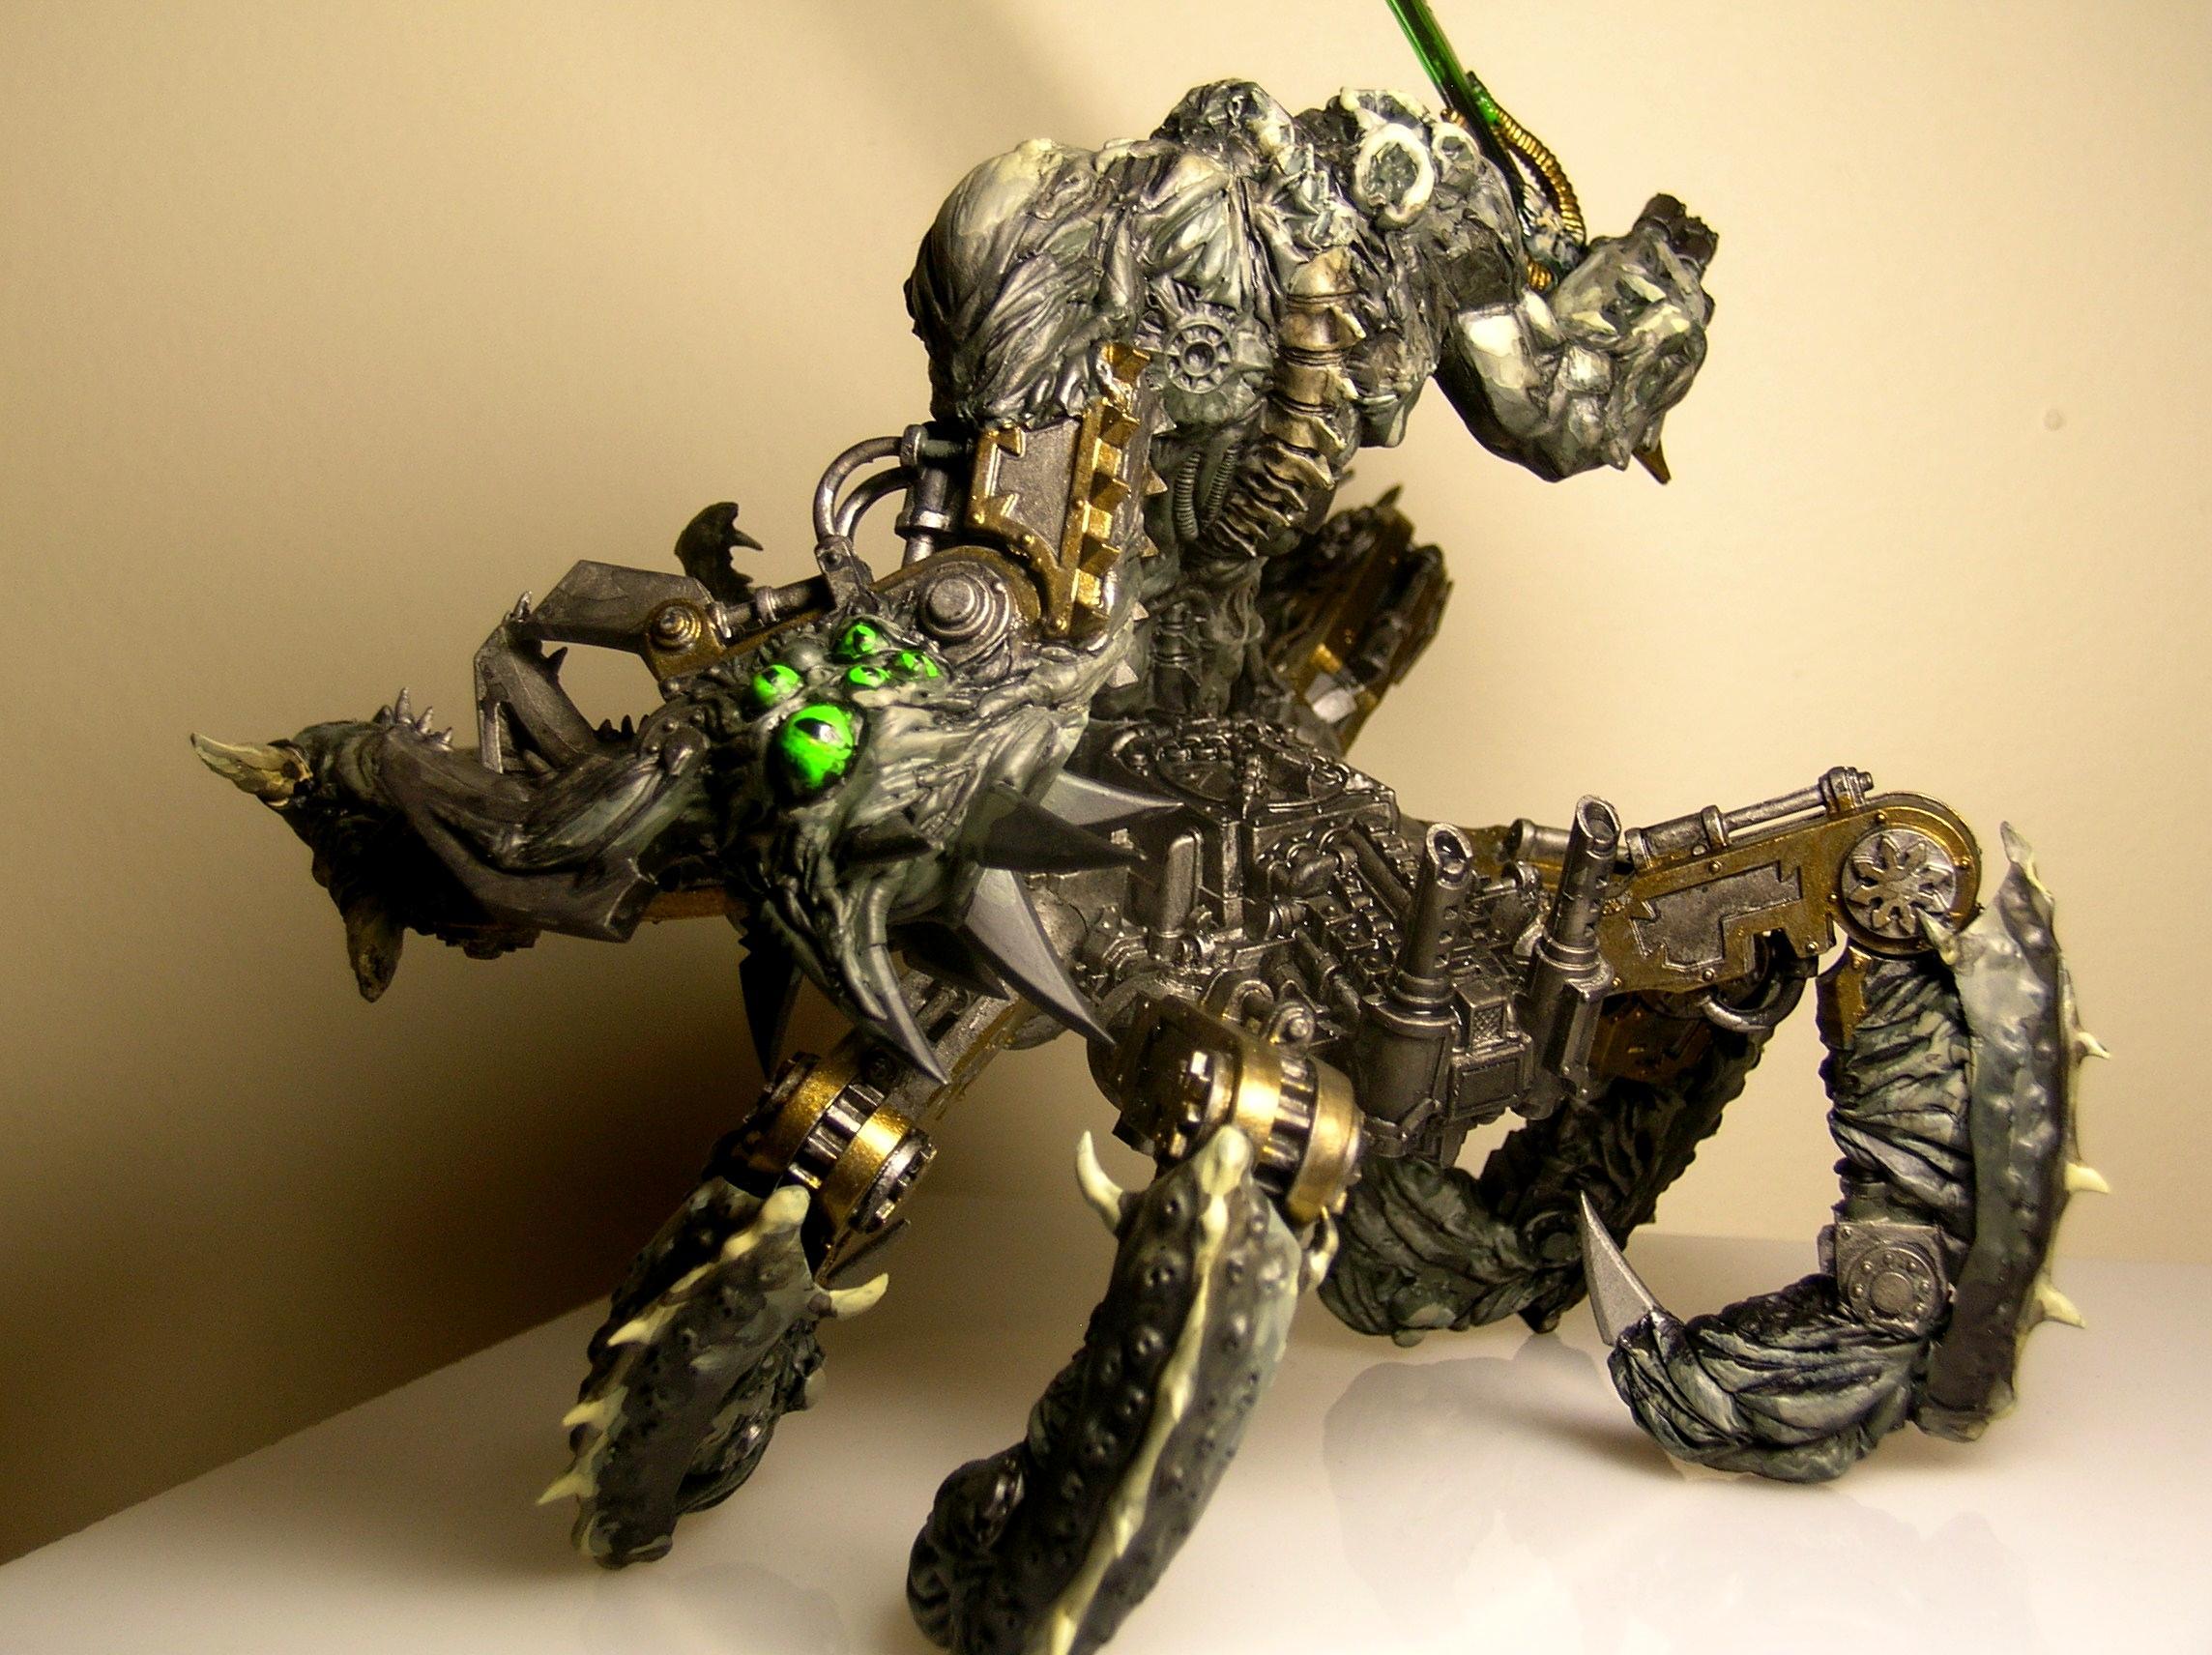 Chaos, Daemons, Nurgle, Soul Grinder, Space Marines, Warhammer 40,000, Warhammer Fantasy